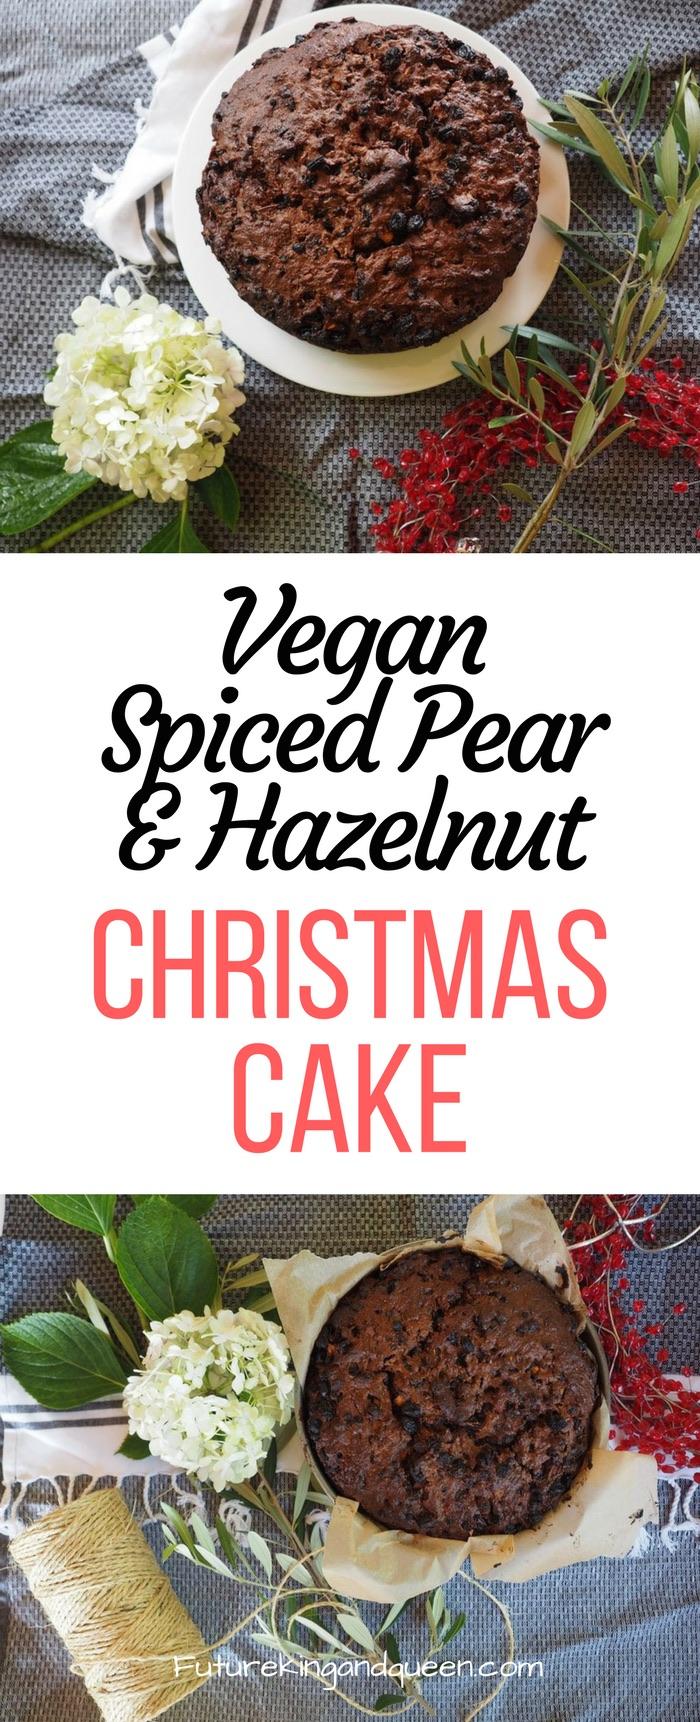 Vegan Spiced Pear and Hazelnut Christmas Cake Recipe Idea